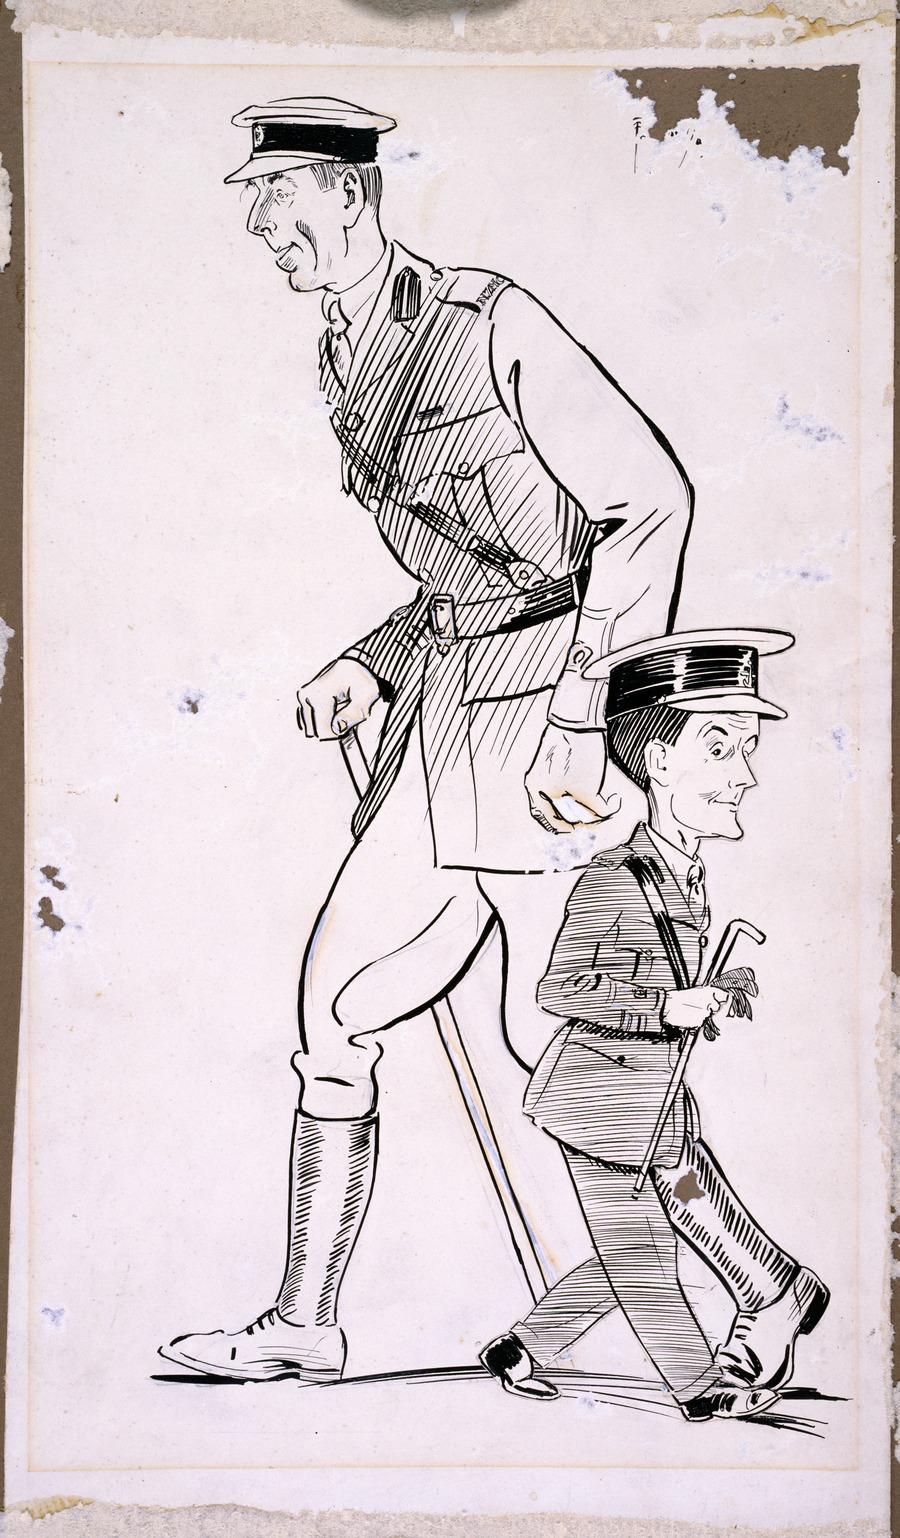 Major McGibbon and Major McCurdy